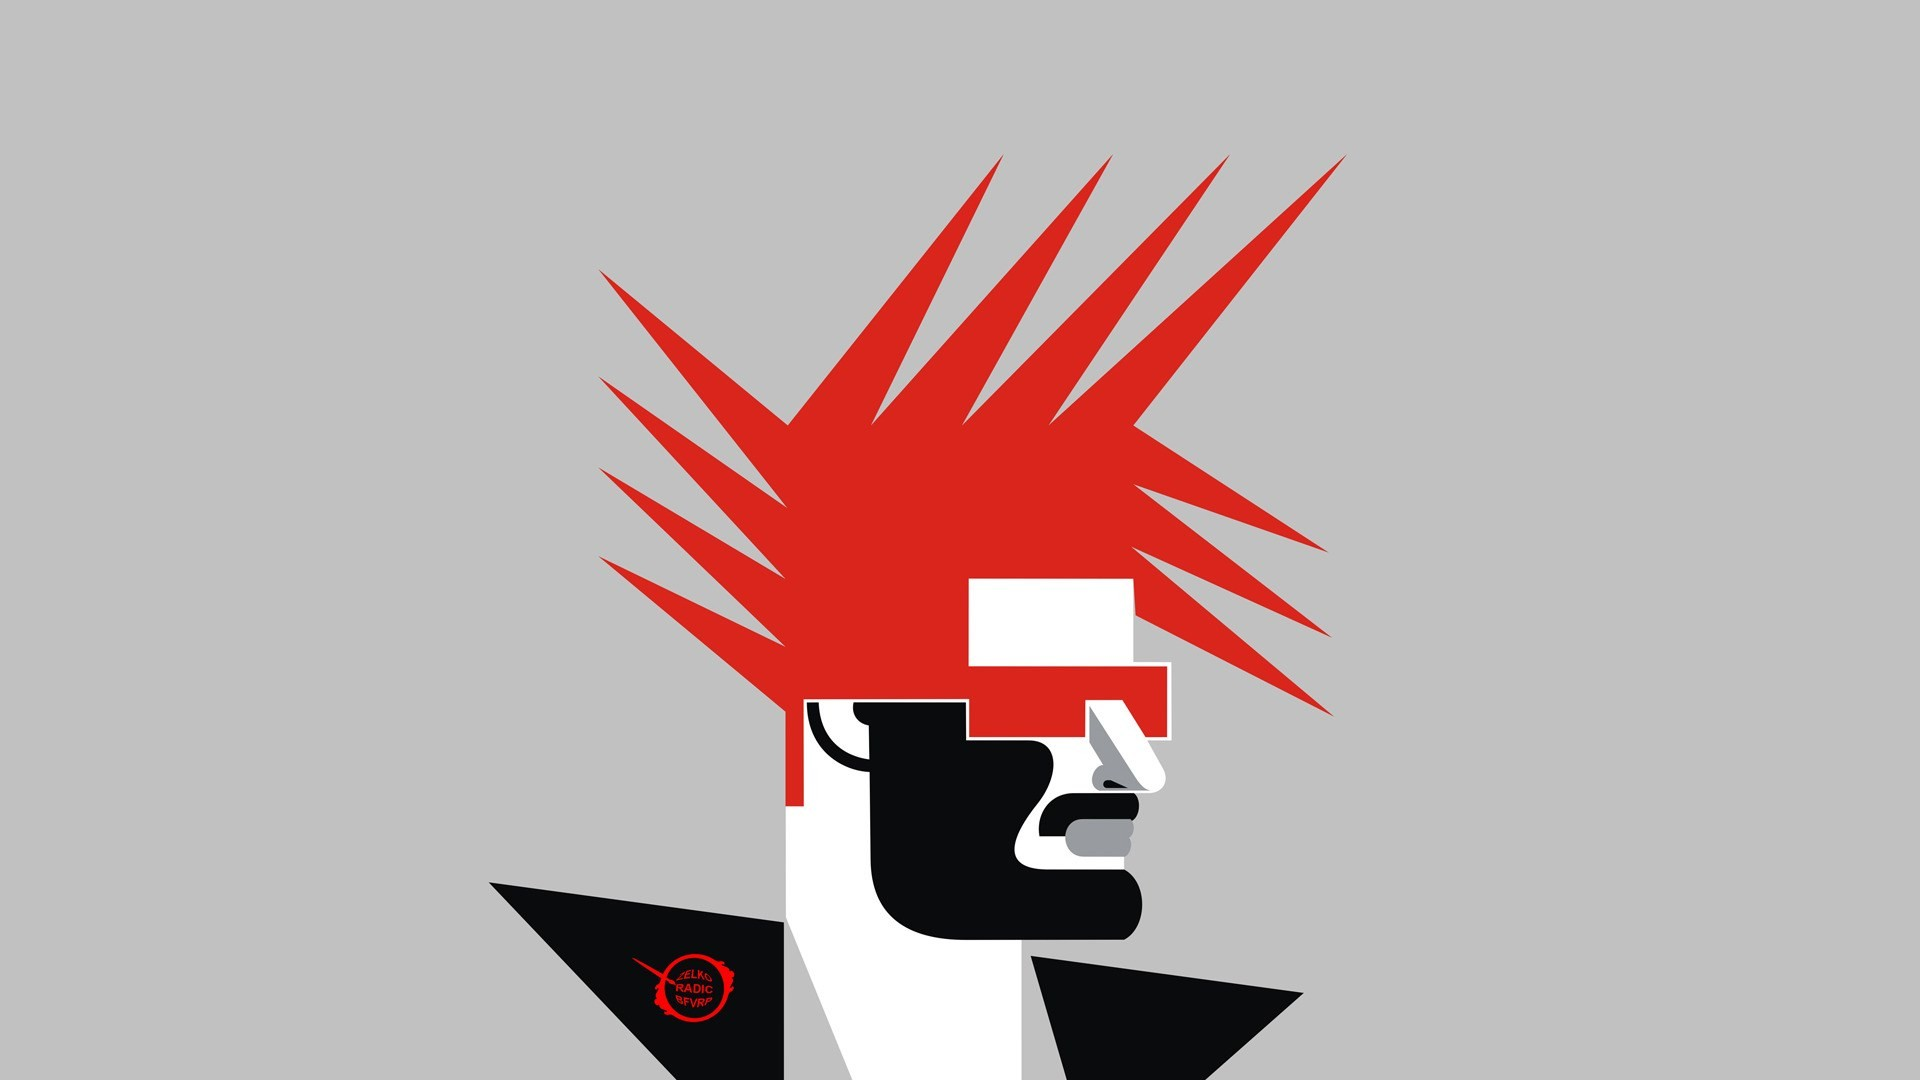 punk rock hd backgrounds